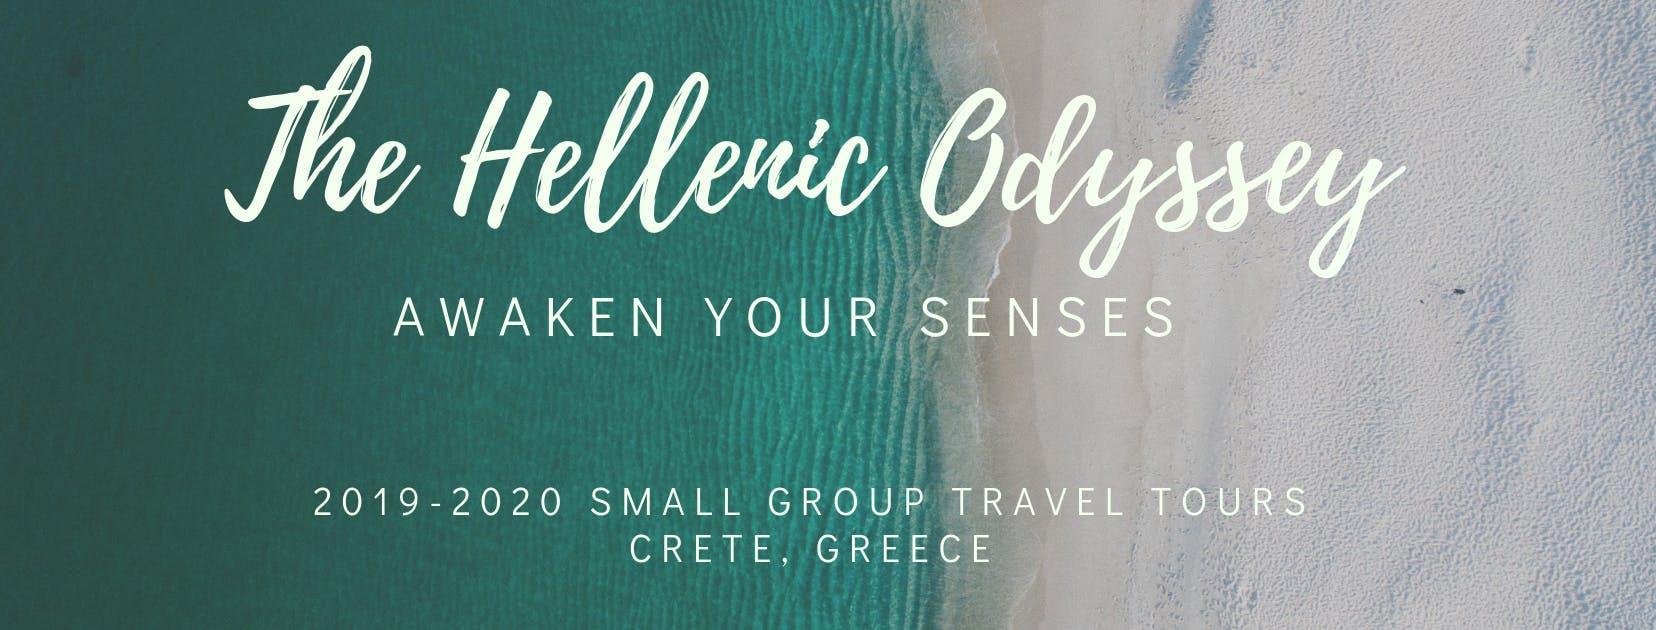 Crete Greek Island Group Travel Tour - The Best of Chania, Greece